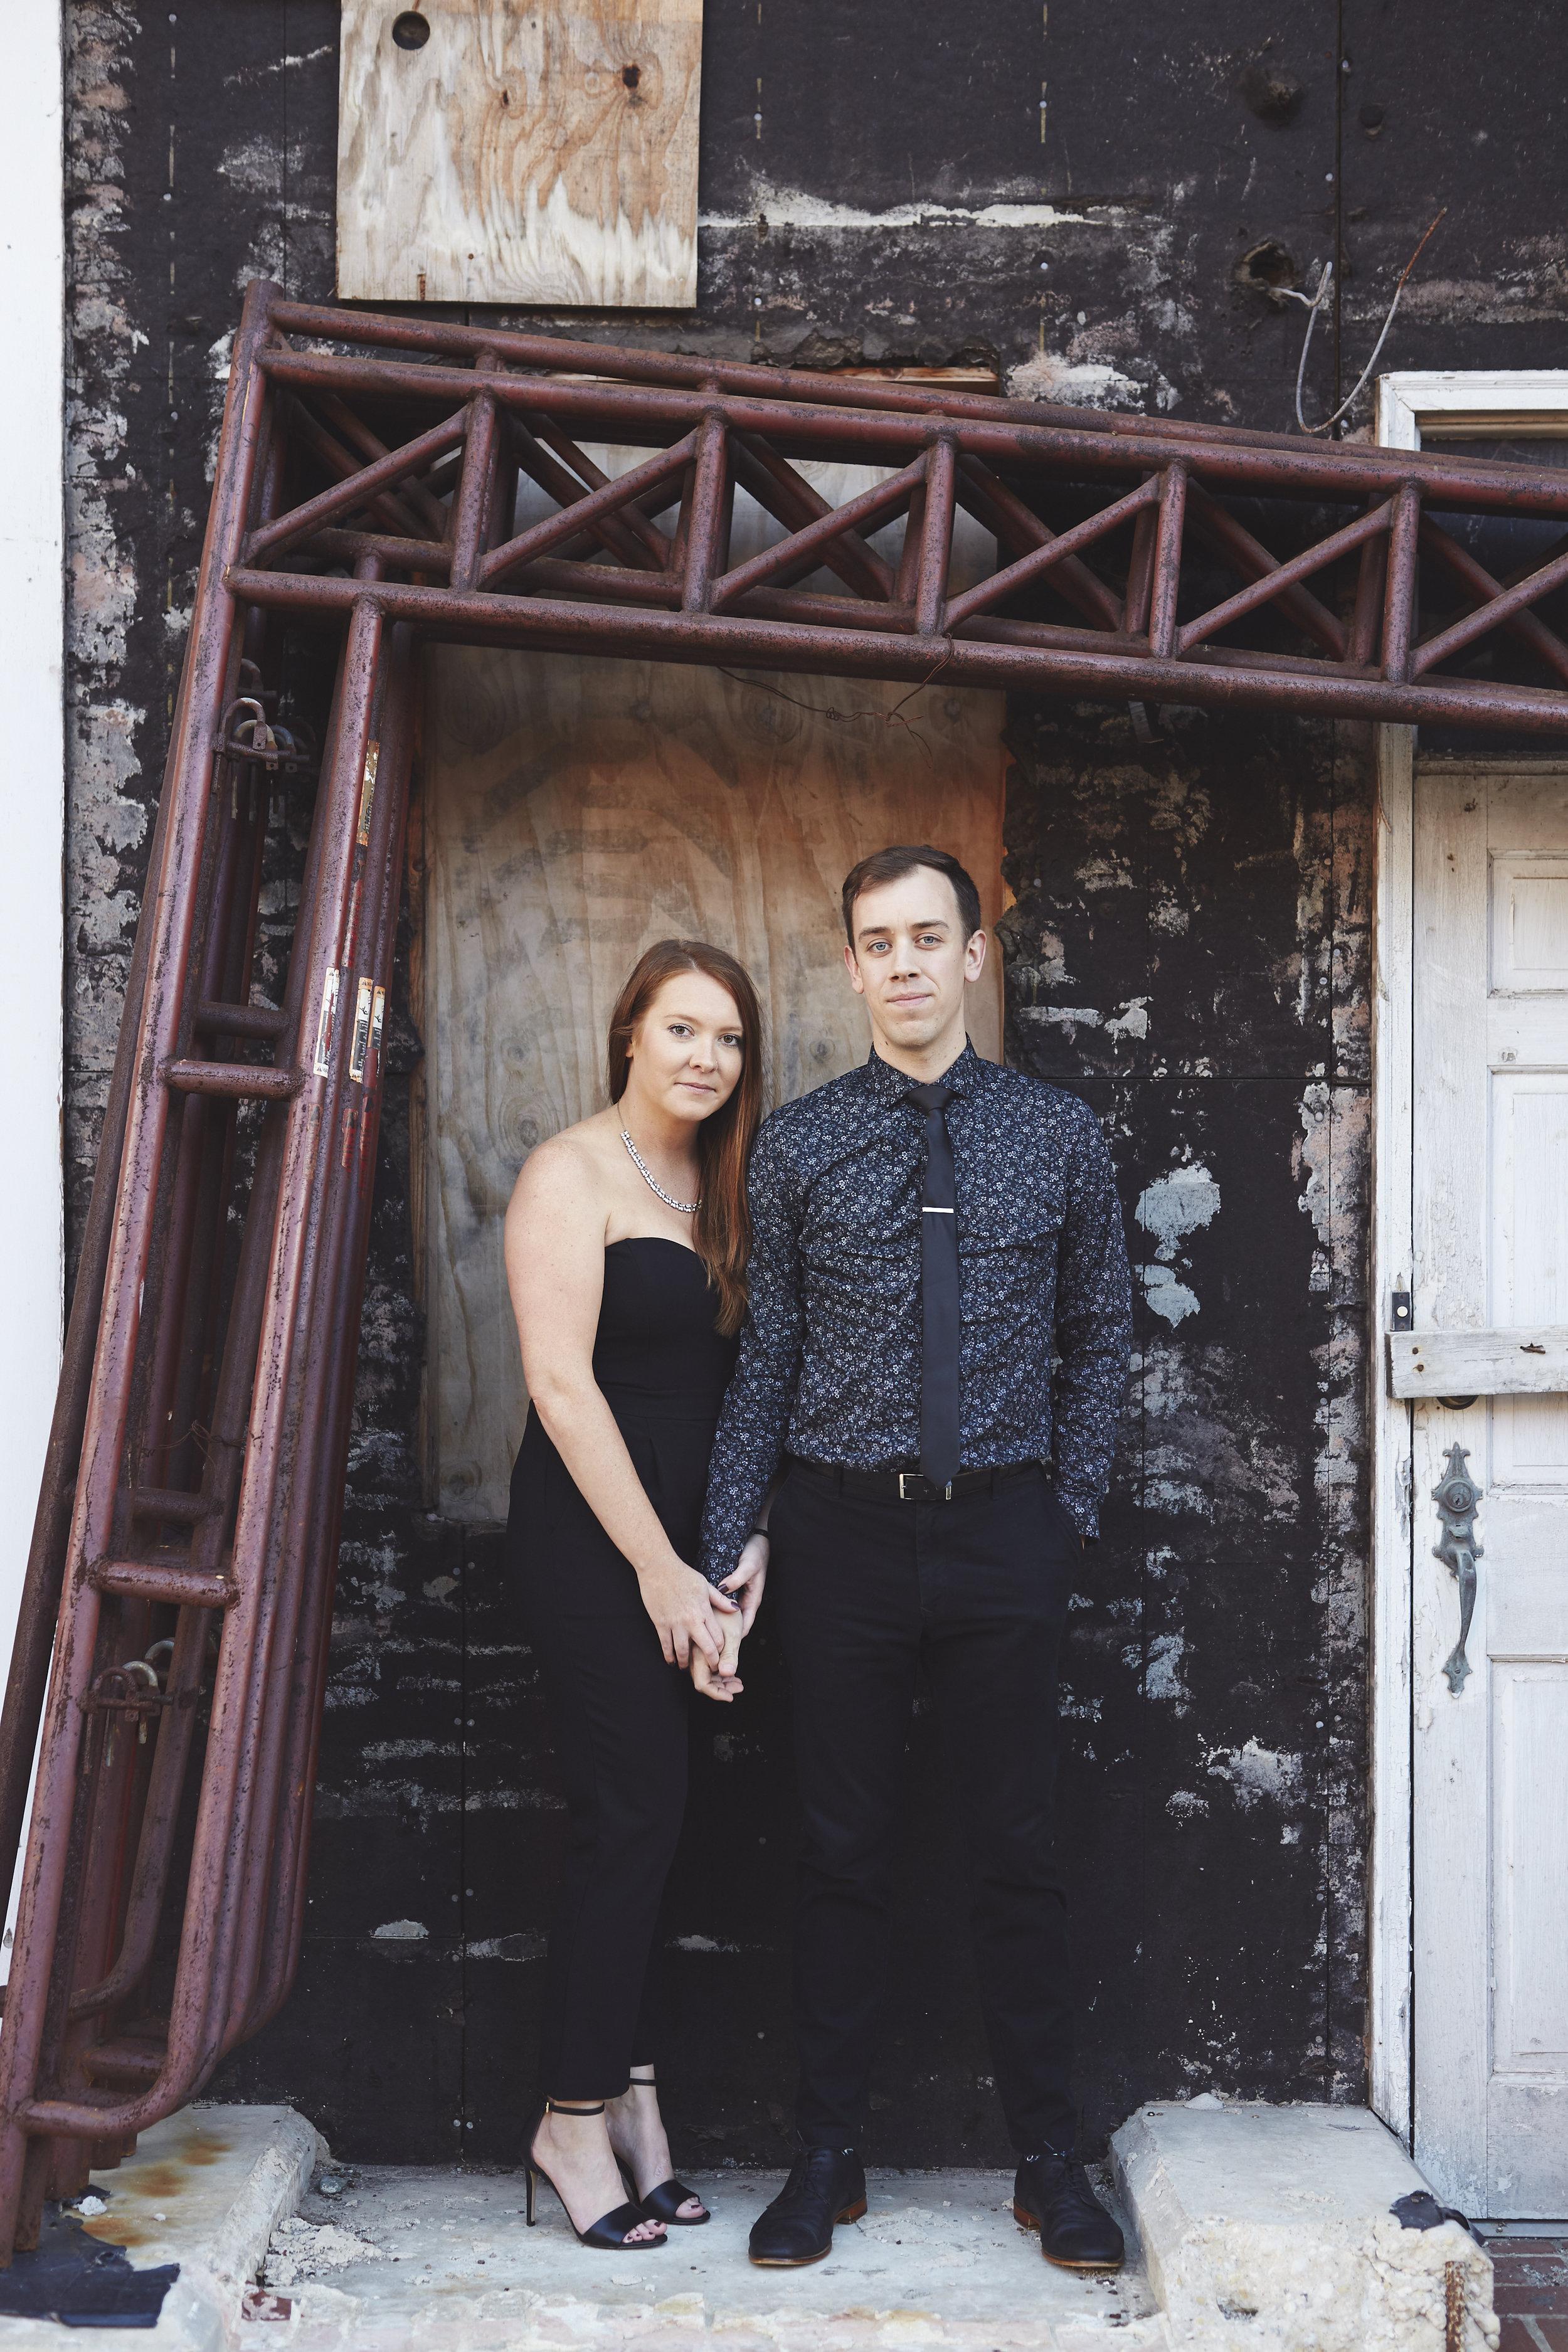 Troy & Kathleen - benromangphoto - 6I5A9907.jpg